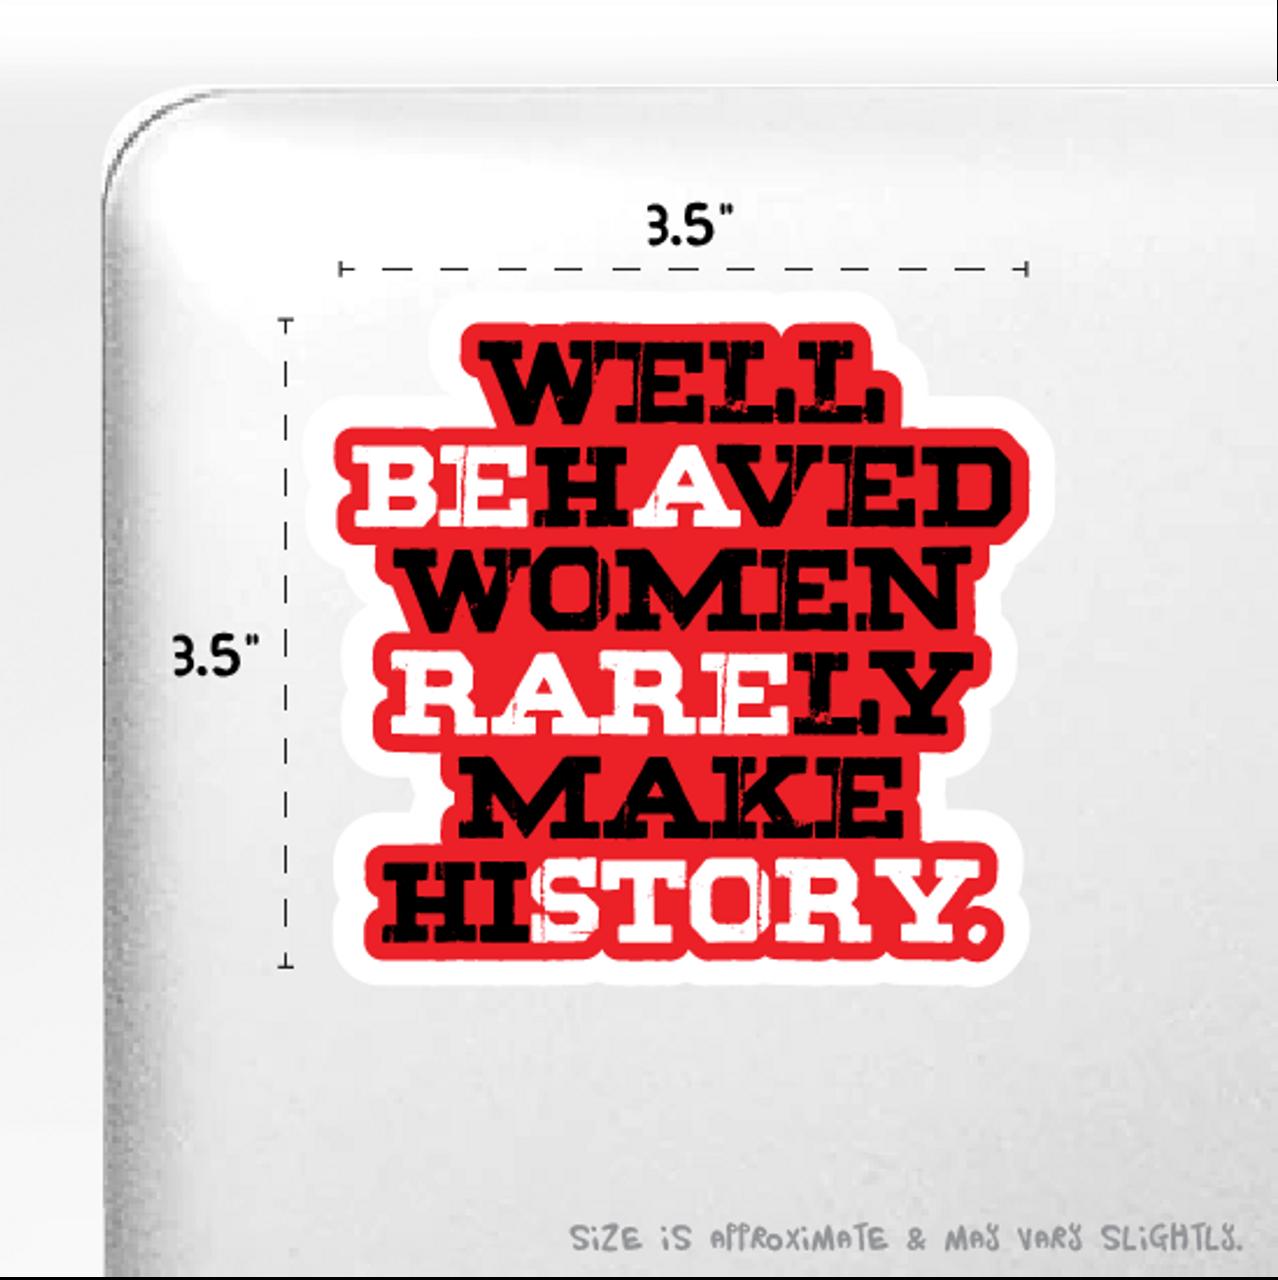 """Well-Behaved Women Rarely Make History"" Sticker 4"" x 4"""